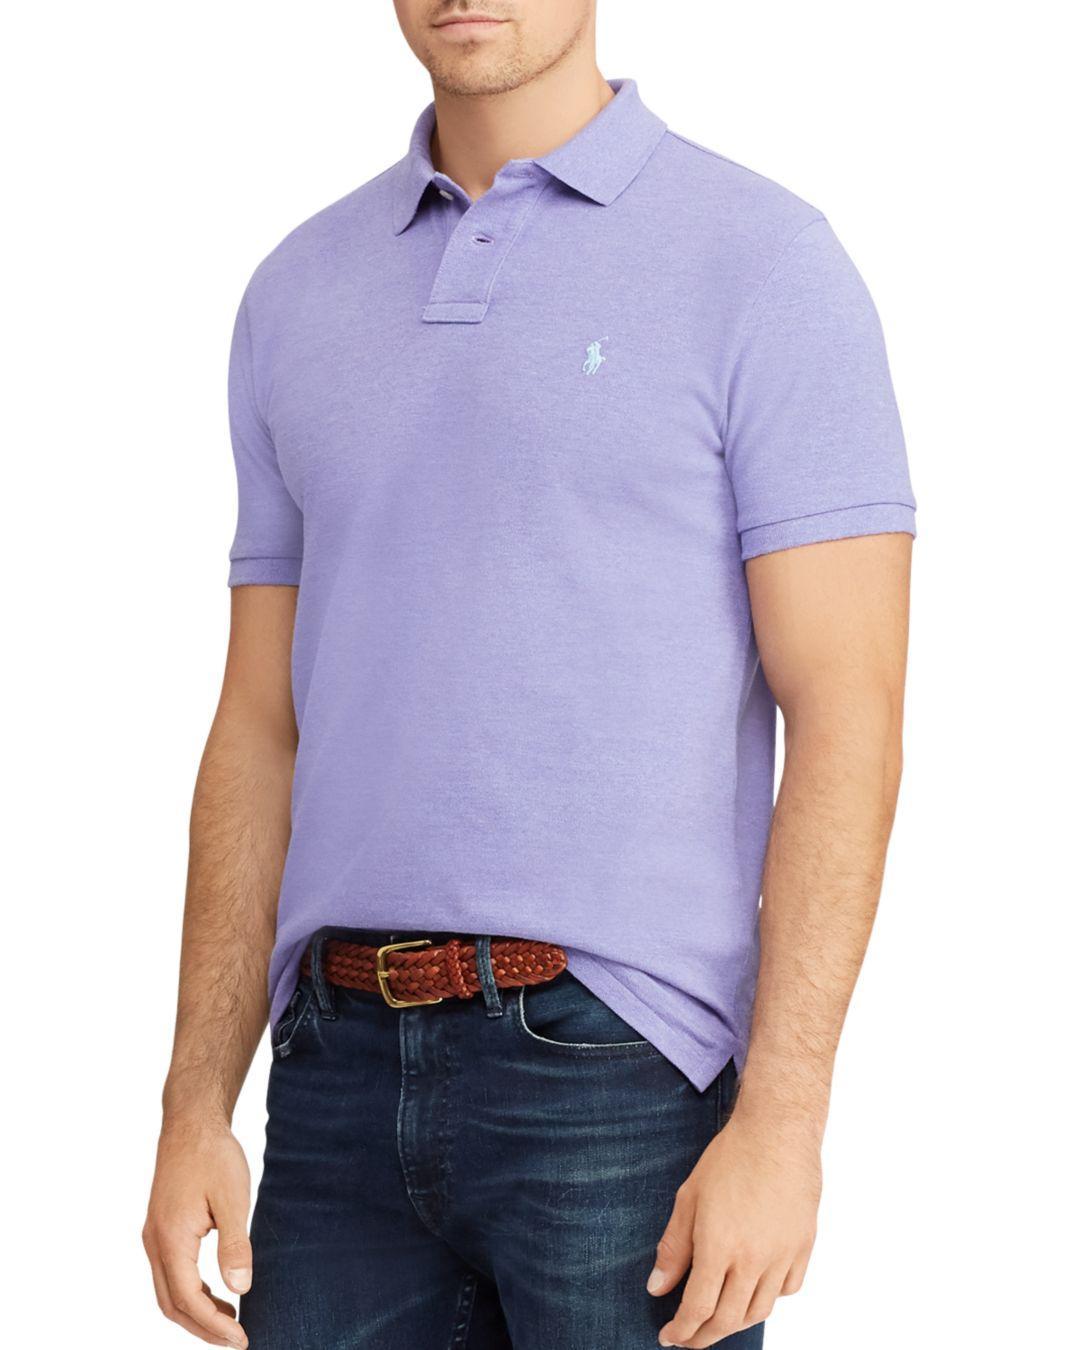 49e81e16d0376 Polo Ralph Lauren. Men s Purple Custom Slim Fit Mesh Short Sleeve Polo Shirt